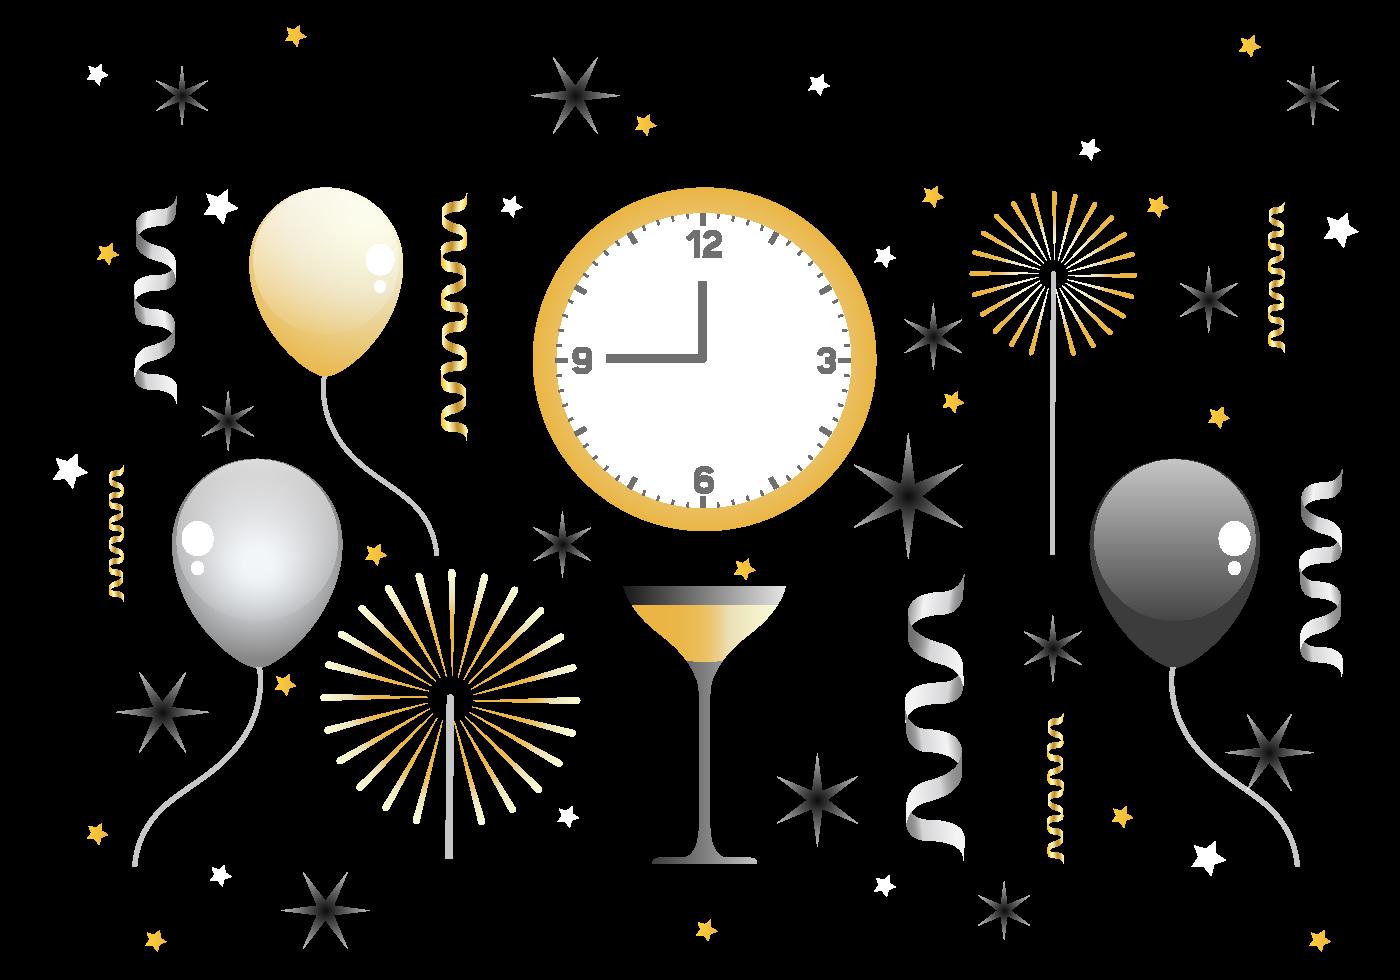 Happy New Year Vector Decorations - Download Free Vectors ...